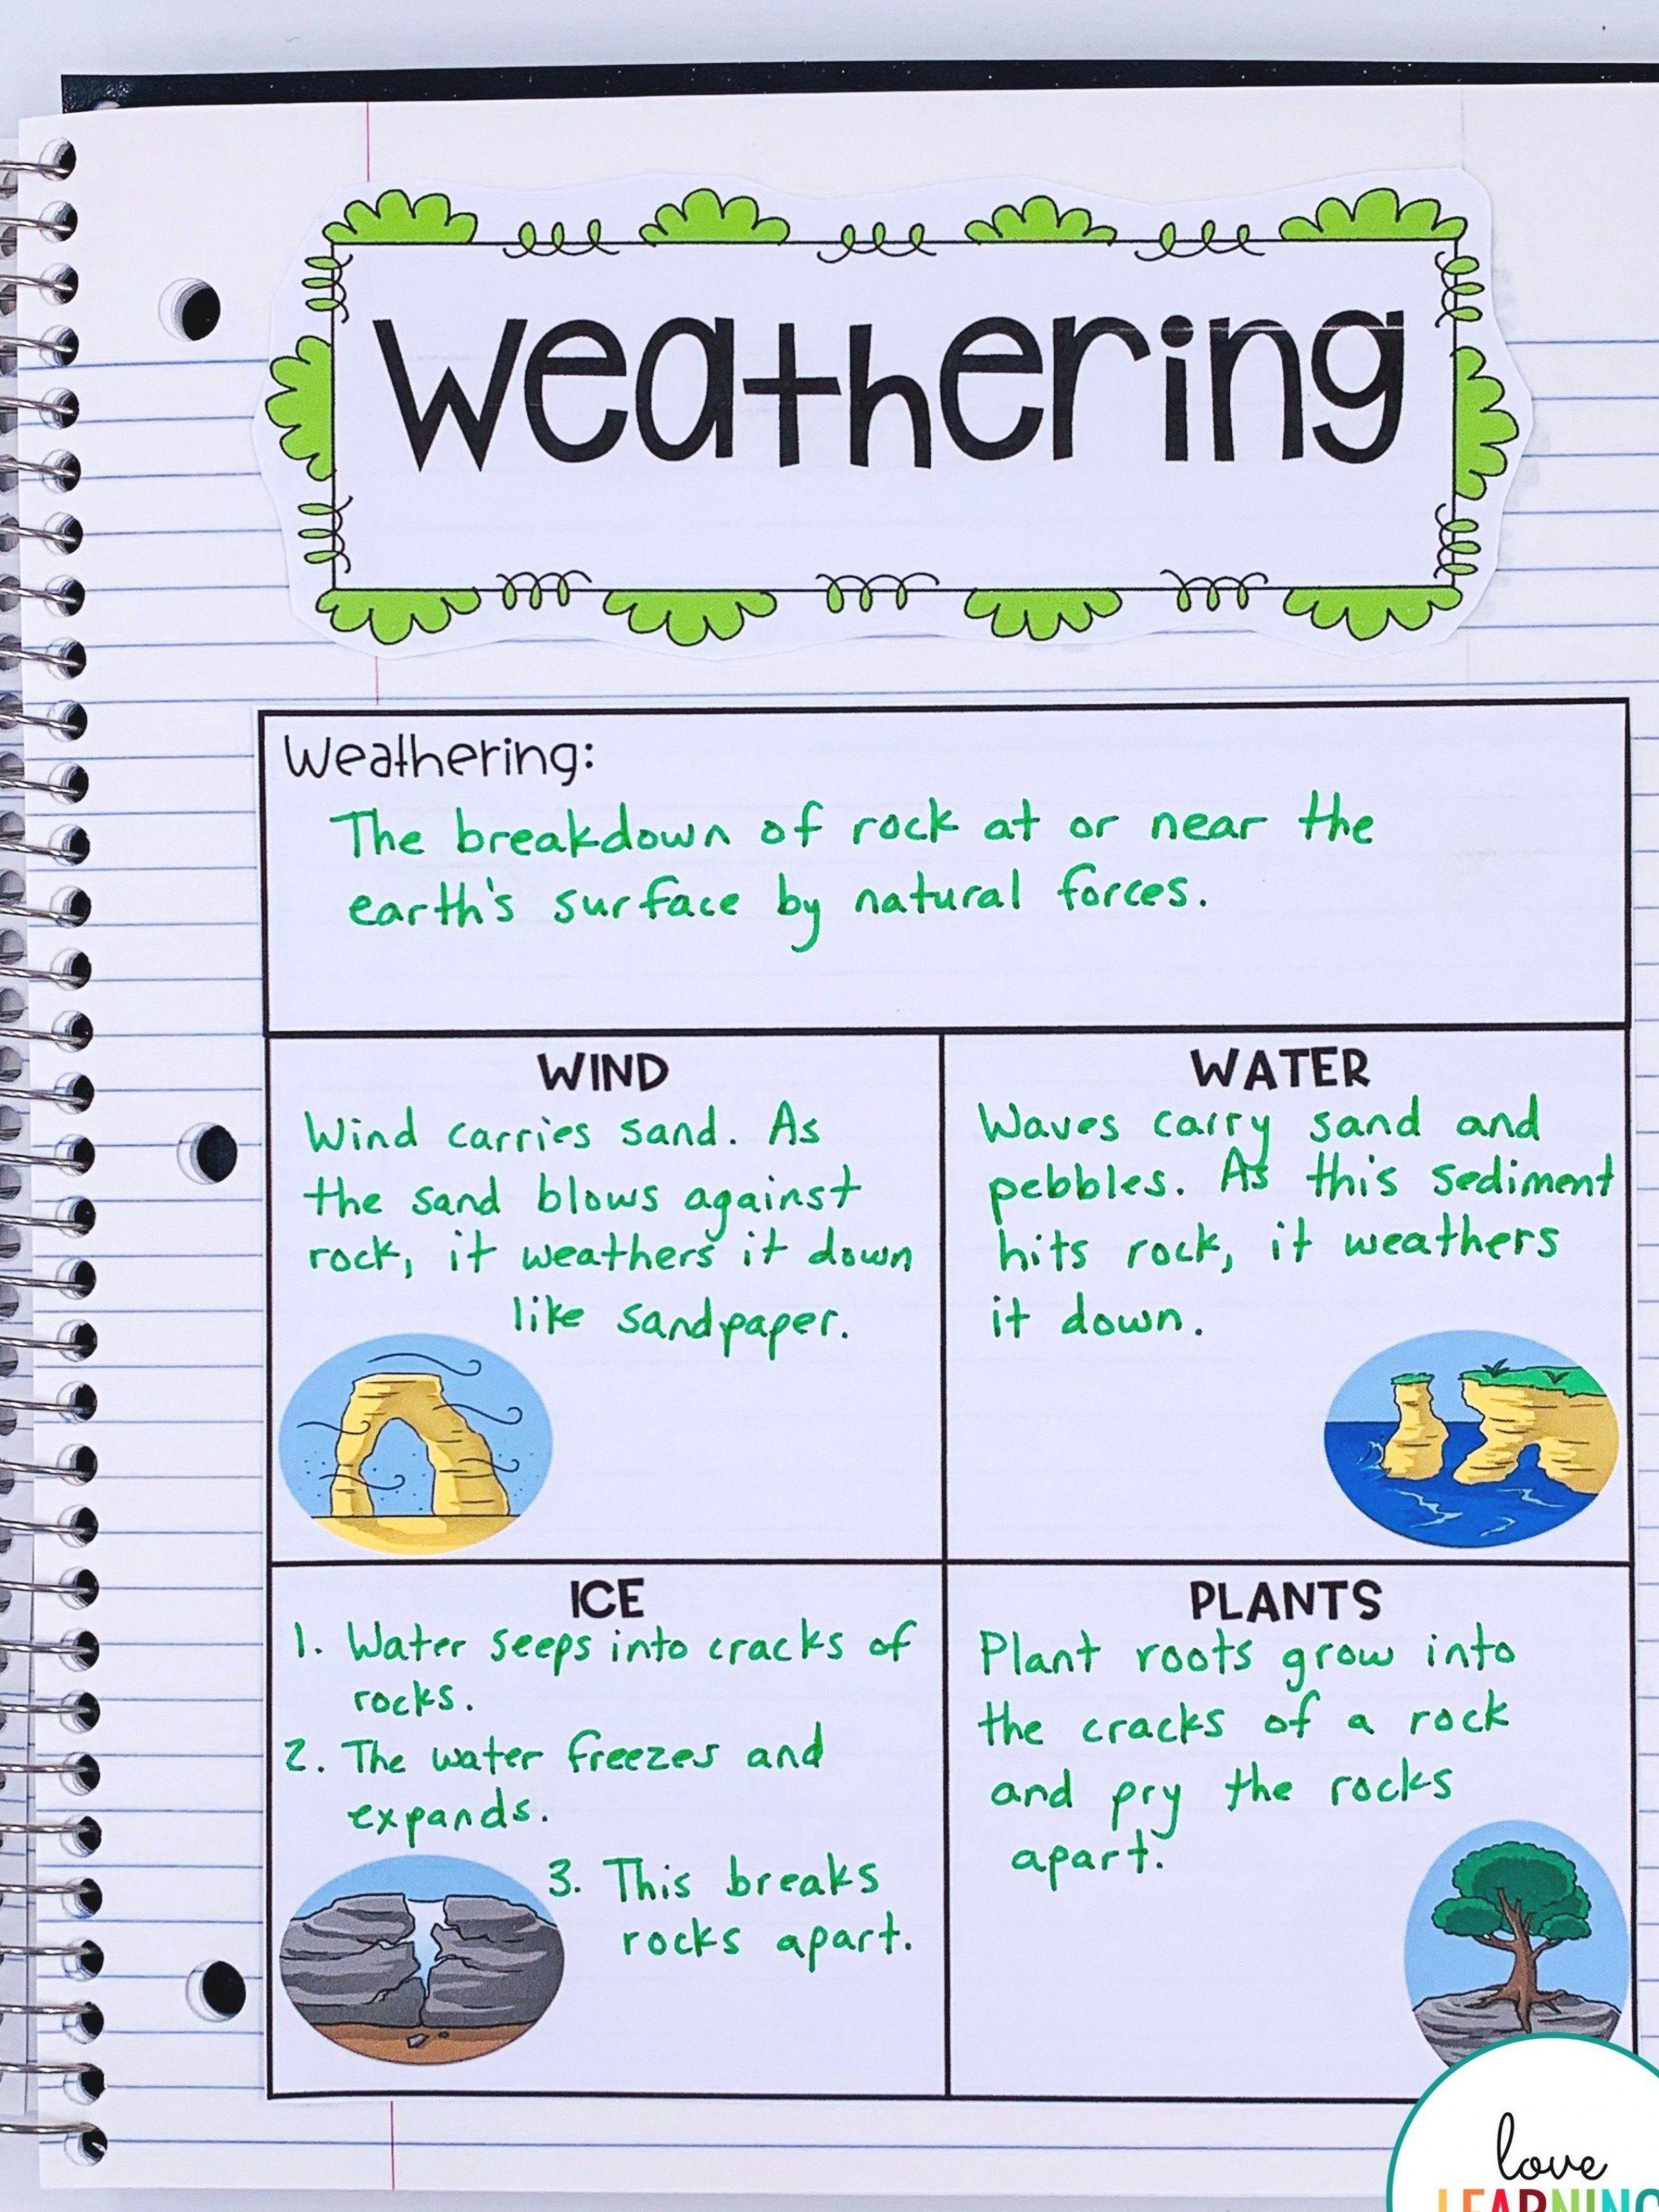 Weathering Park Erosion Worksheet   Printable Worksheets and Activities for  Teachers [ 3550 x 2662 Pixel ]